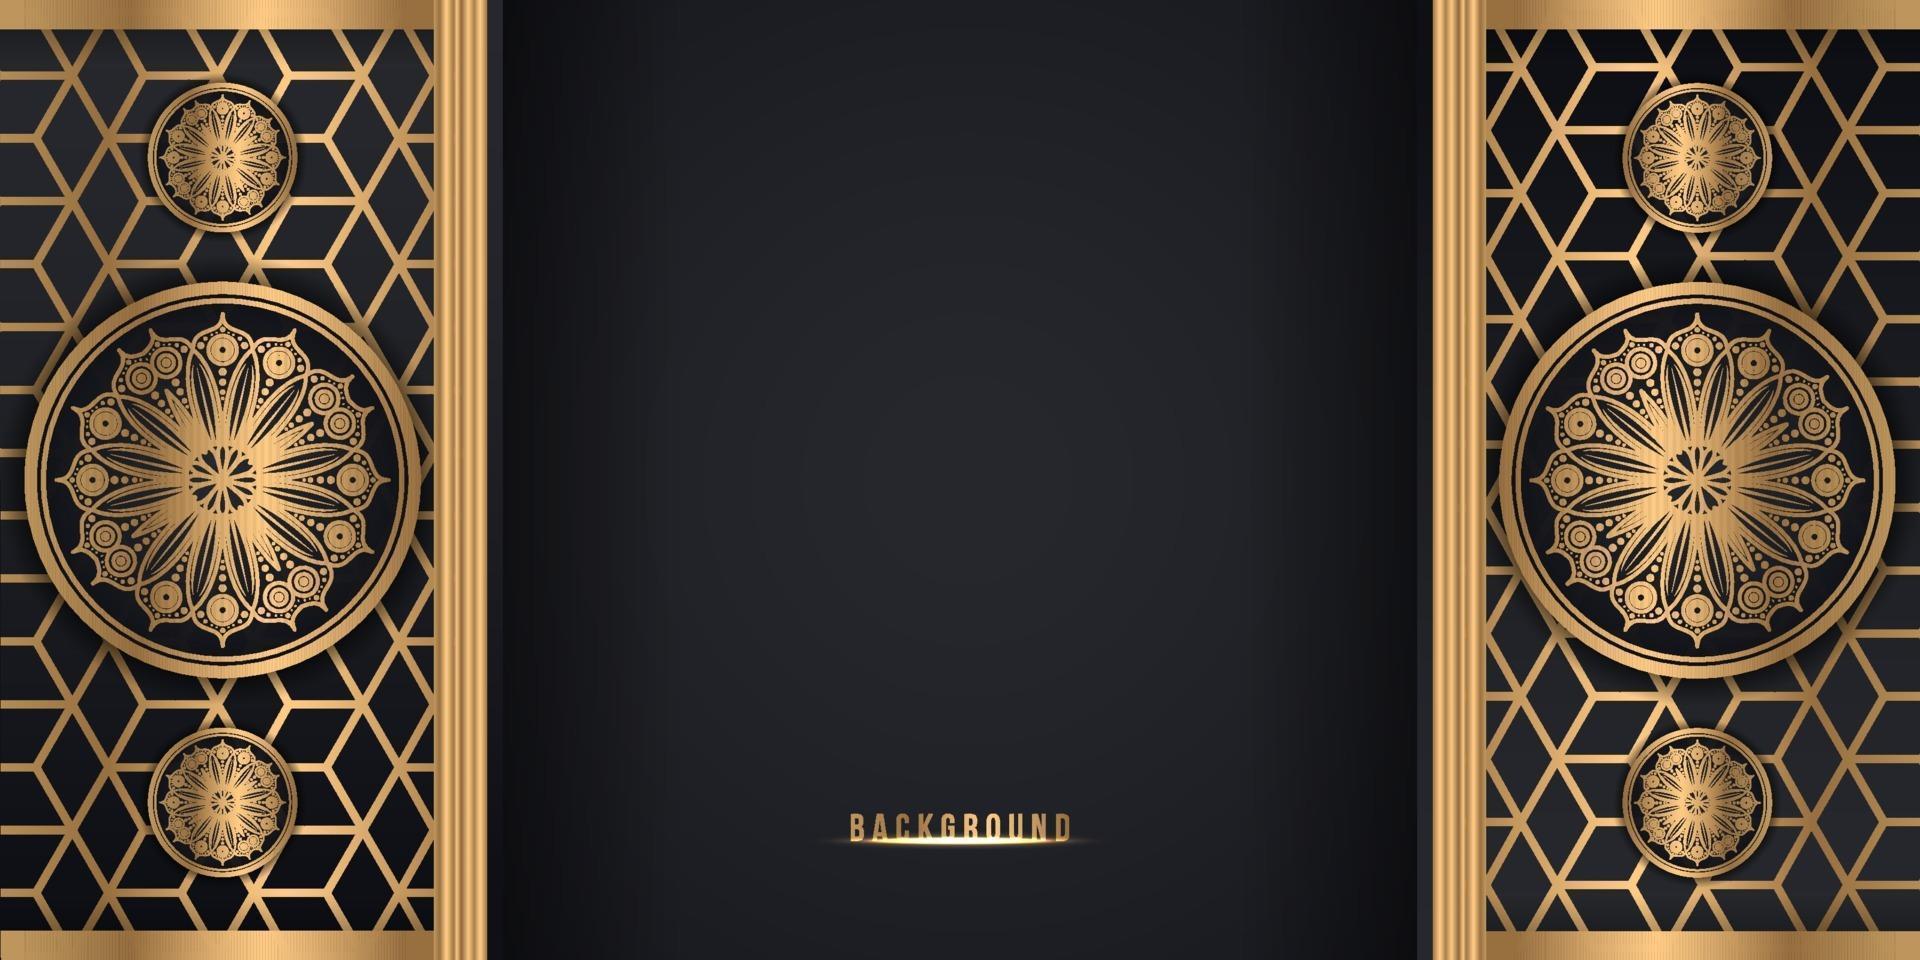 Black and gold decorative mandala flower style background vector